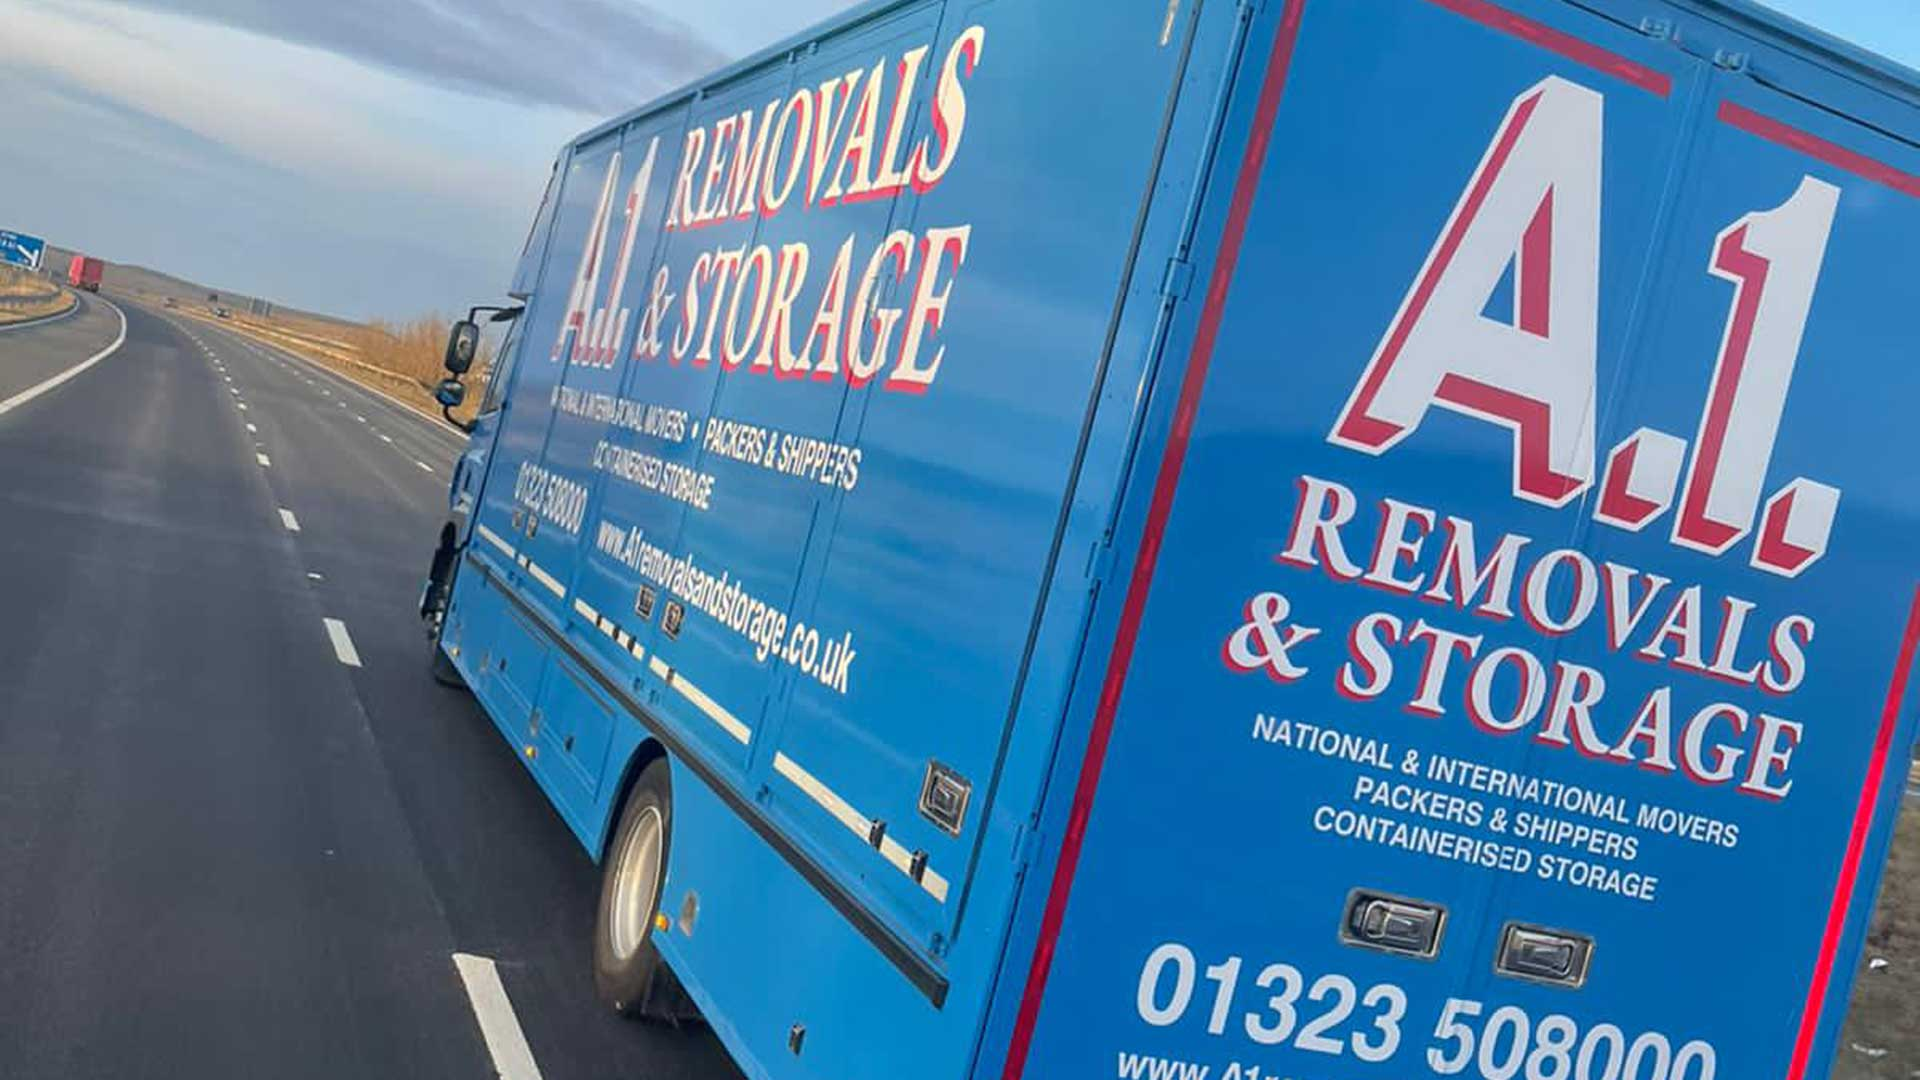 A1 Removals & Storage van driving on a motorway